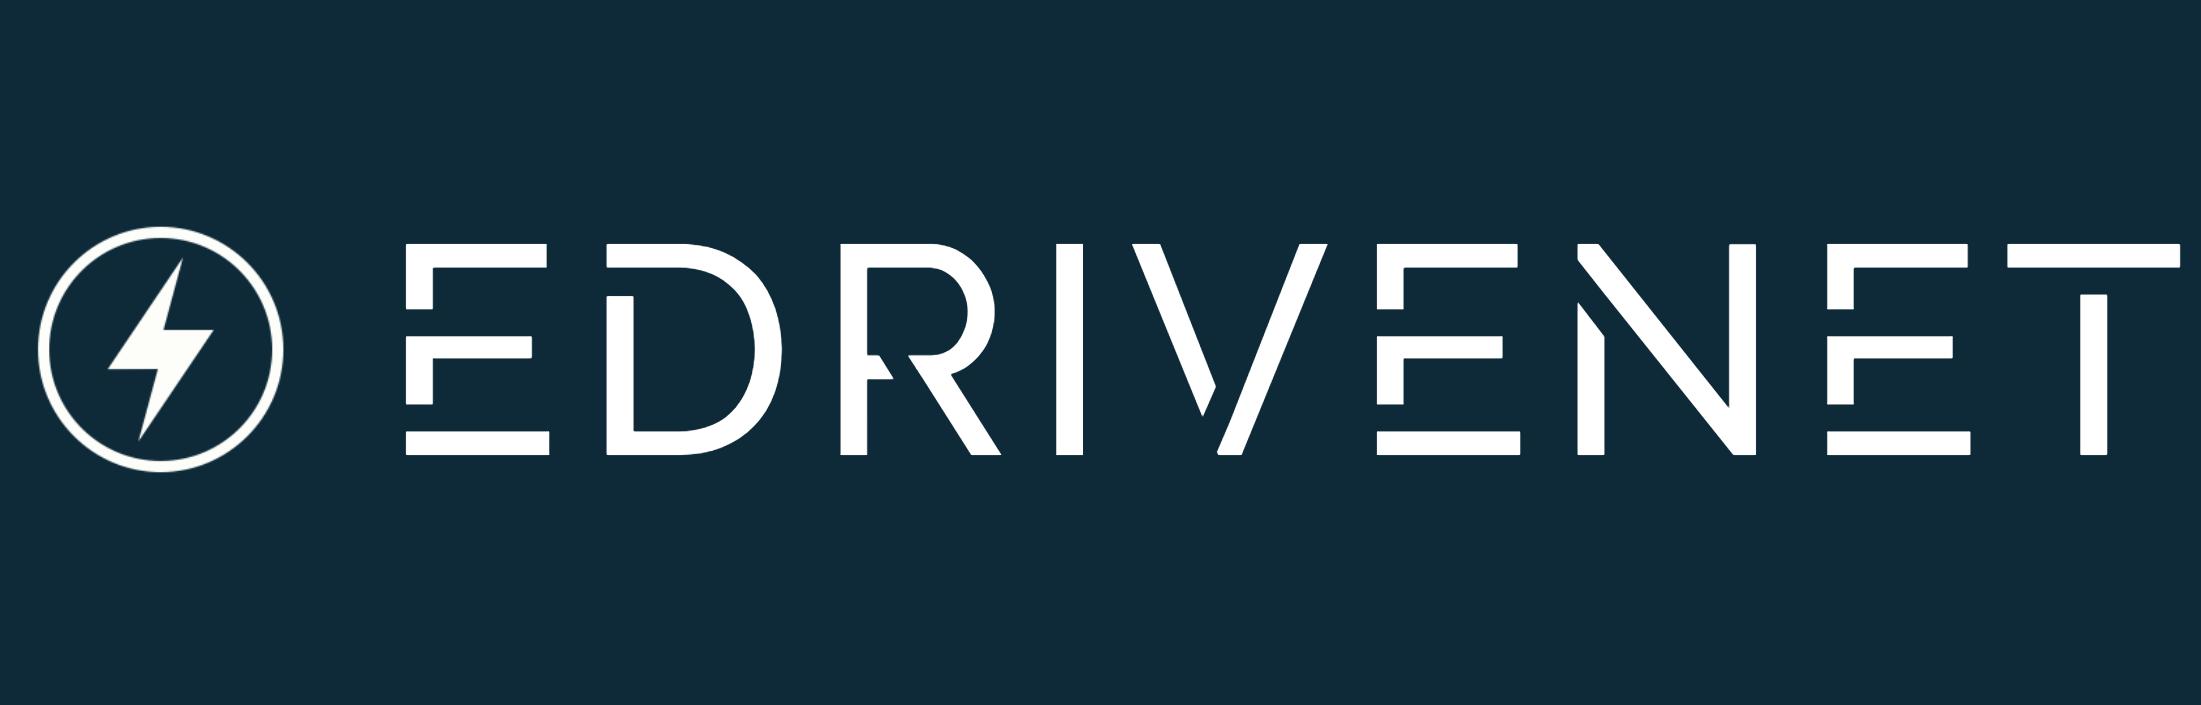 Edrivenet logo